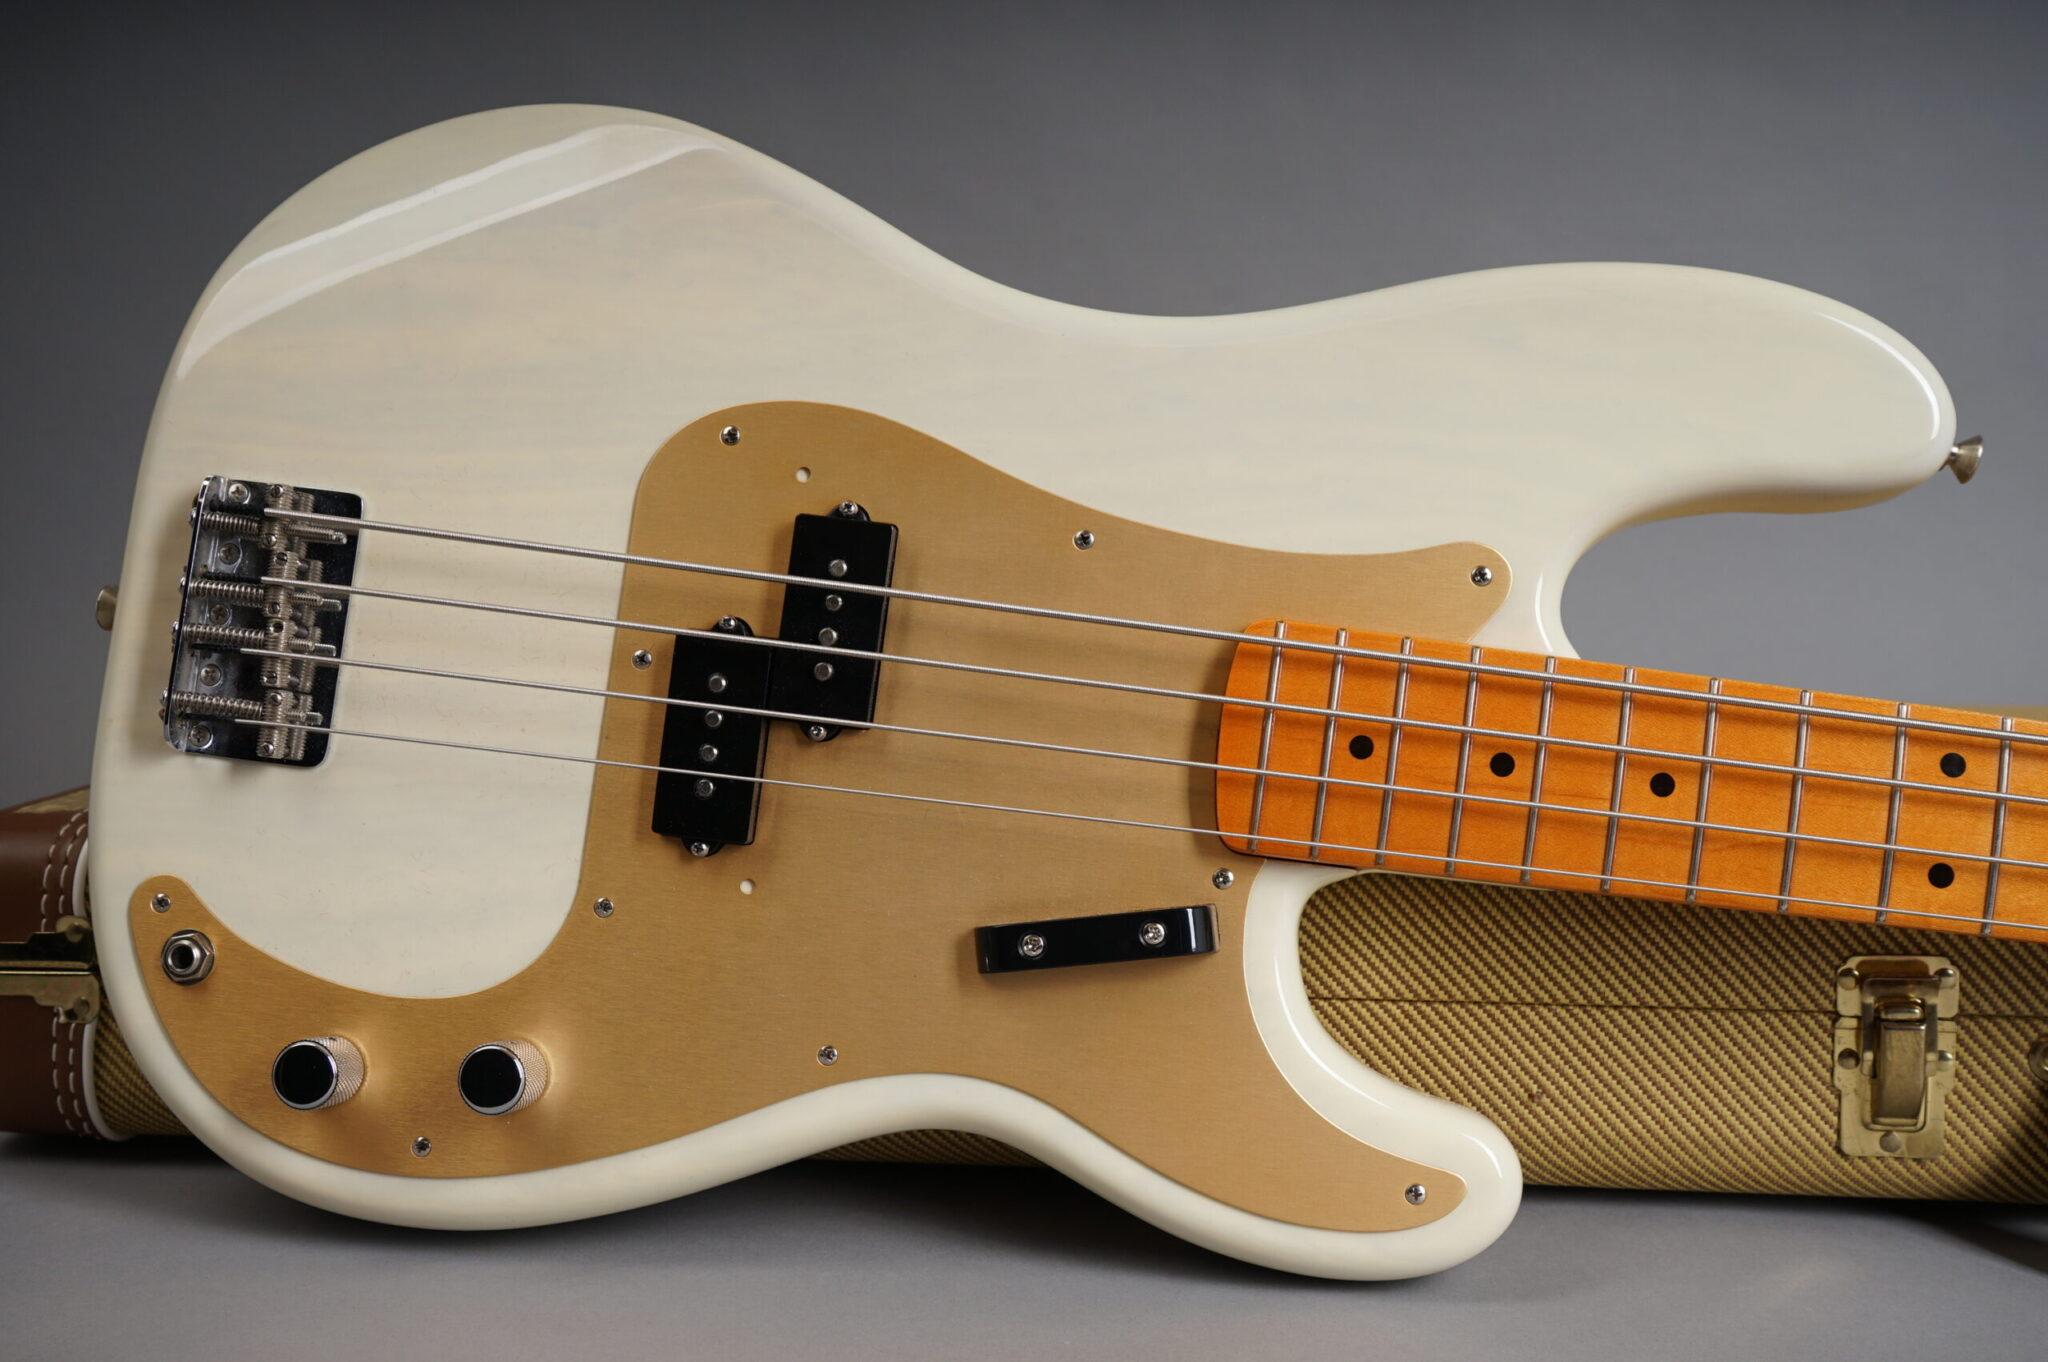 https://guitarpoint.de/app/uploads/products/2001-fender-american-vintage-1957-precision-bass-blond/2001-Fender-American-Vintage-1957-Precision-Bass-Blond-V126861-10-scaled-2048x1362.jpg